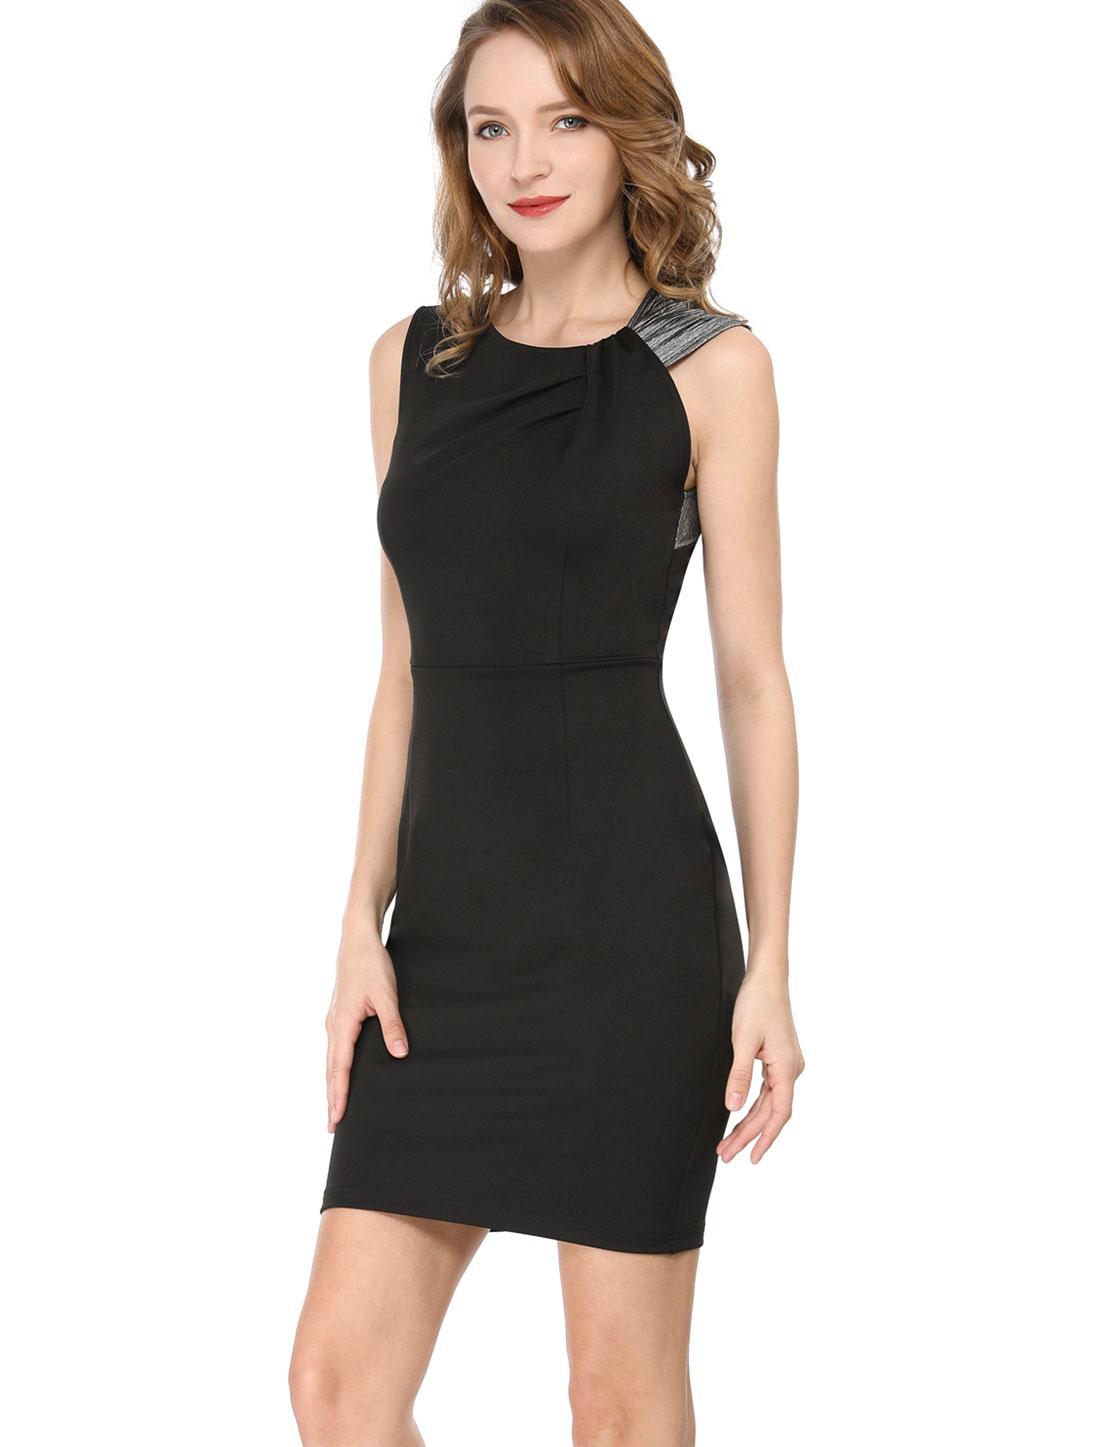 Allegra K Women's Metallic Shiny Shoulder Party Sheath Dress Black M